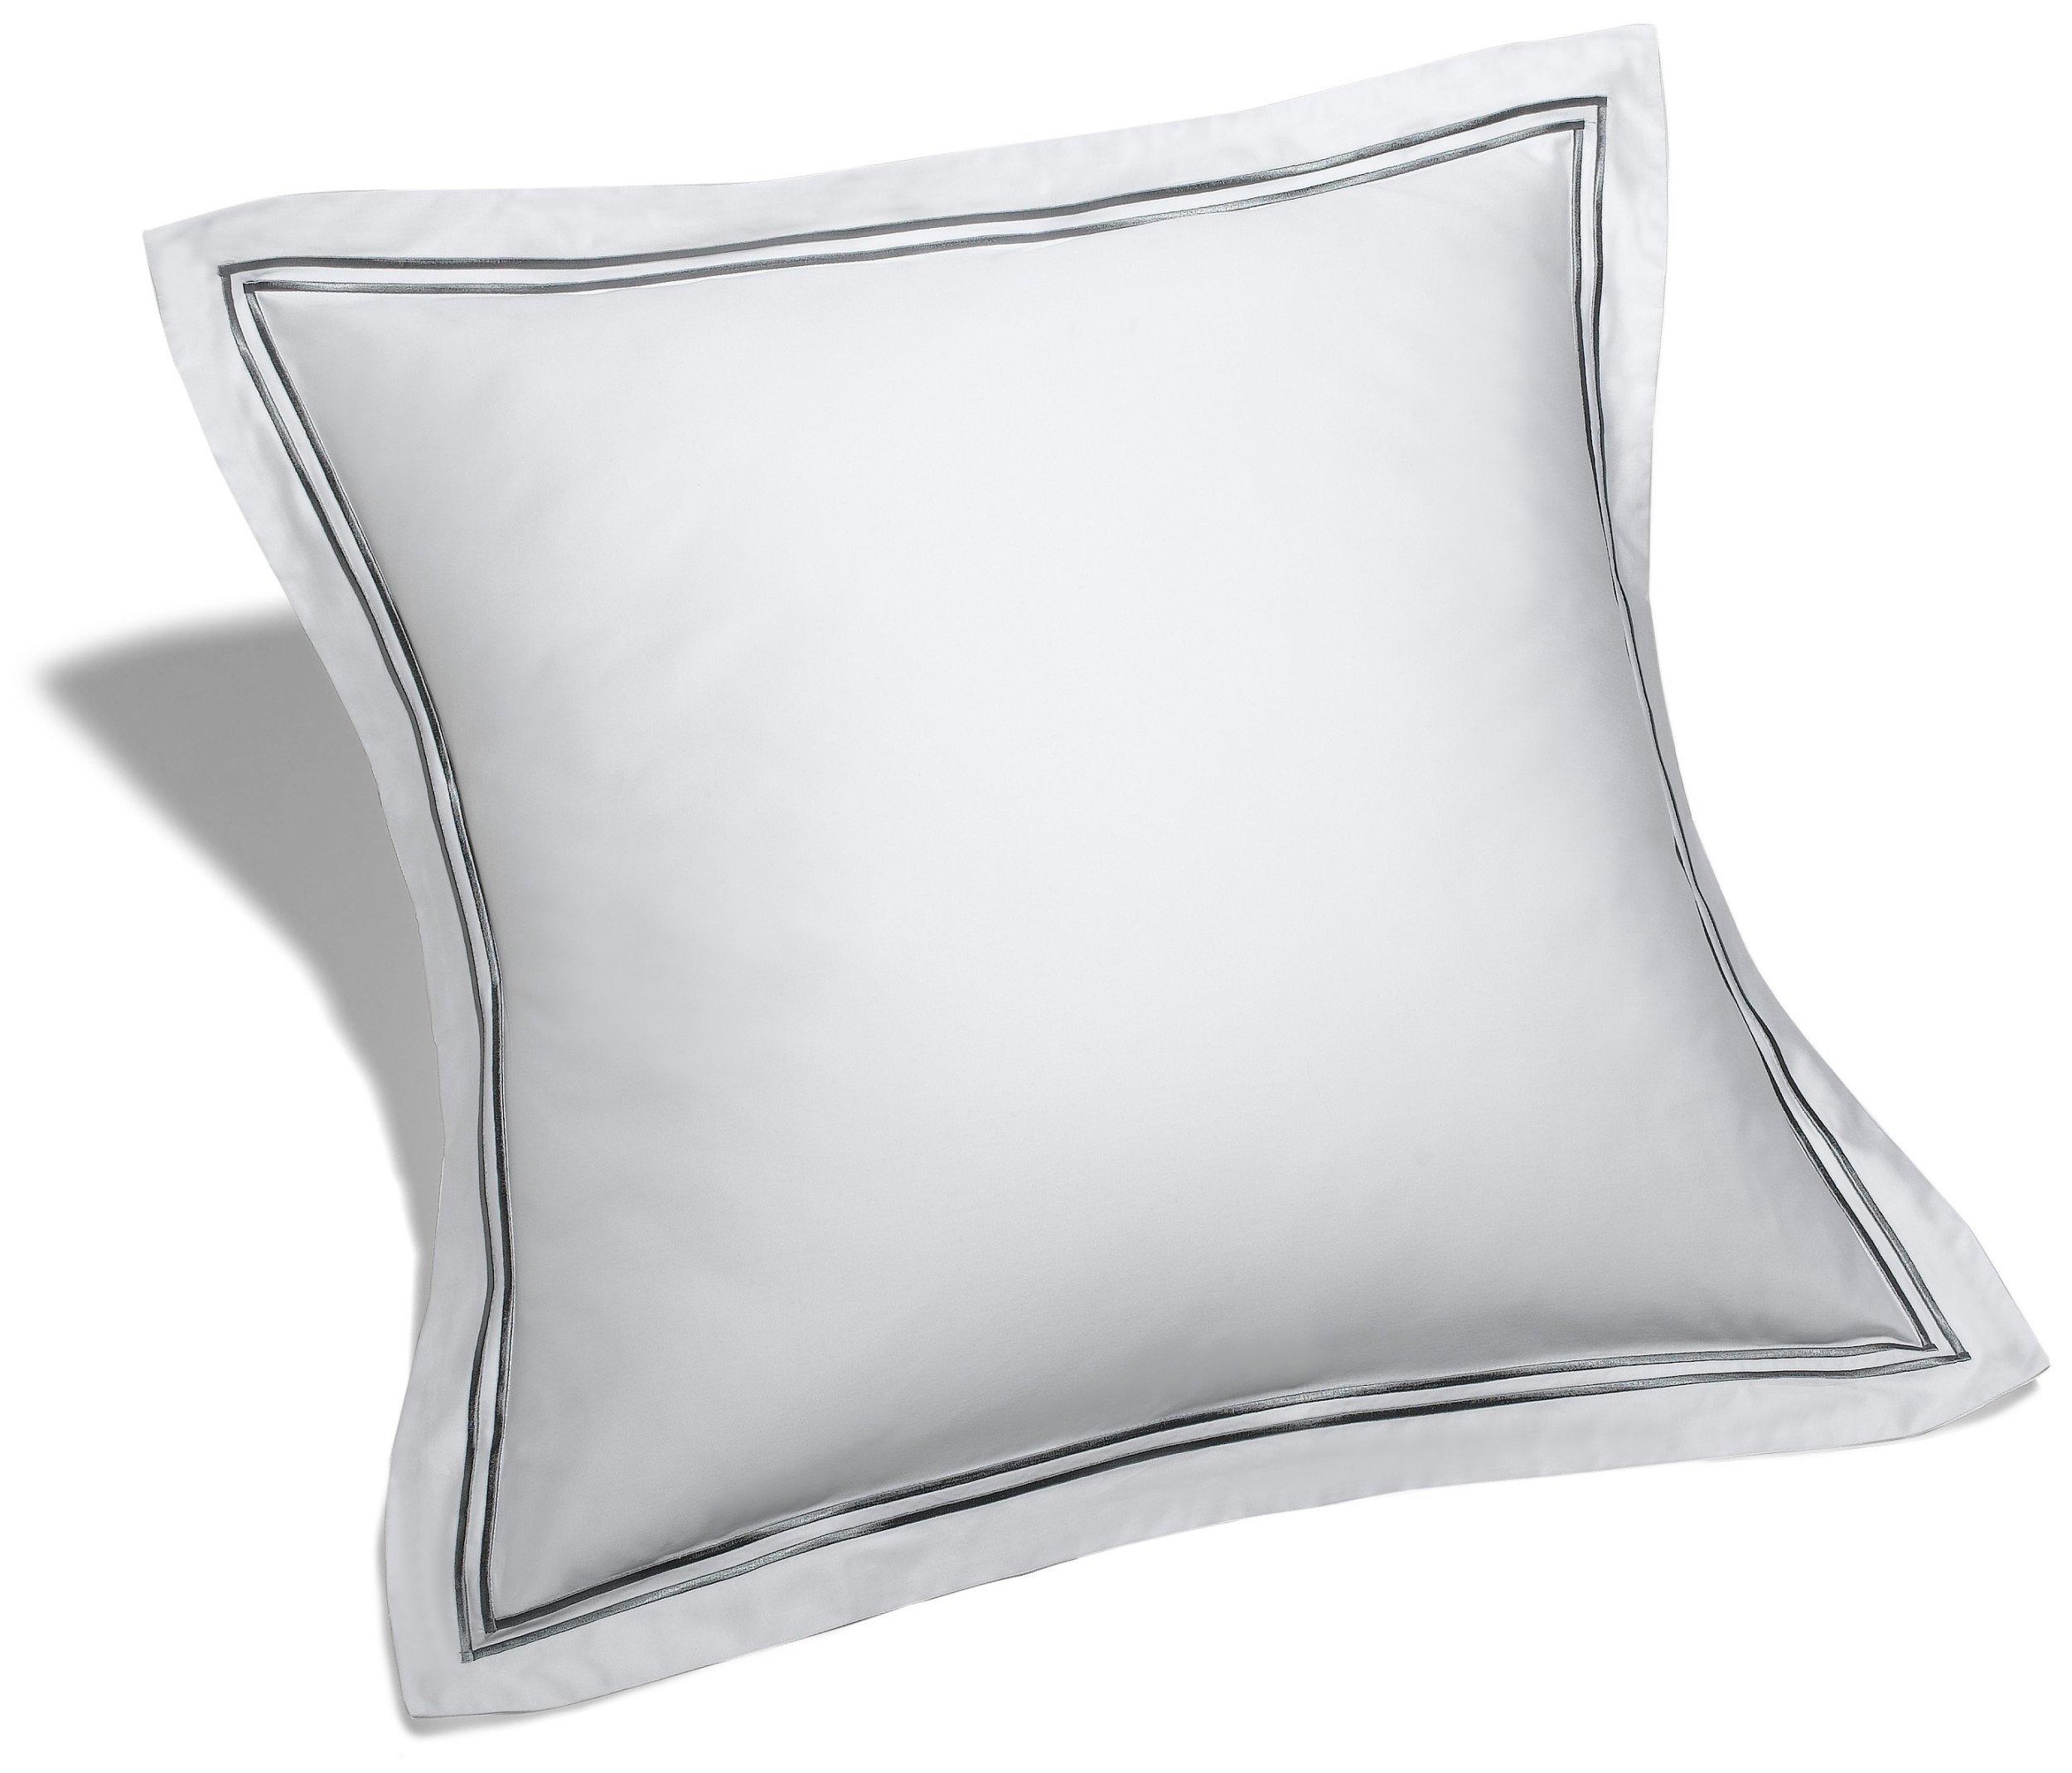 Pinzon 400-Thread-Count Egyptian Cotton Sateen Hotel Stitch Sham - European, Silver Grey by Pinzon by Amazon